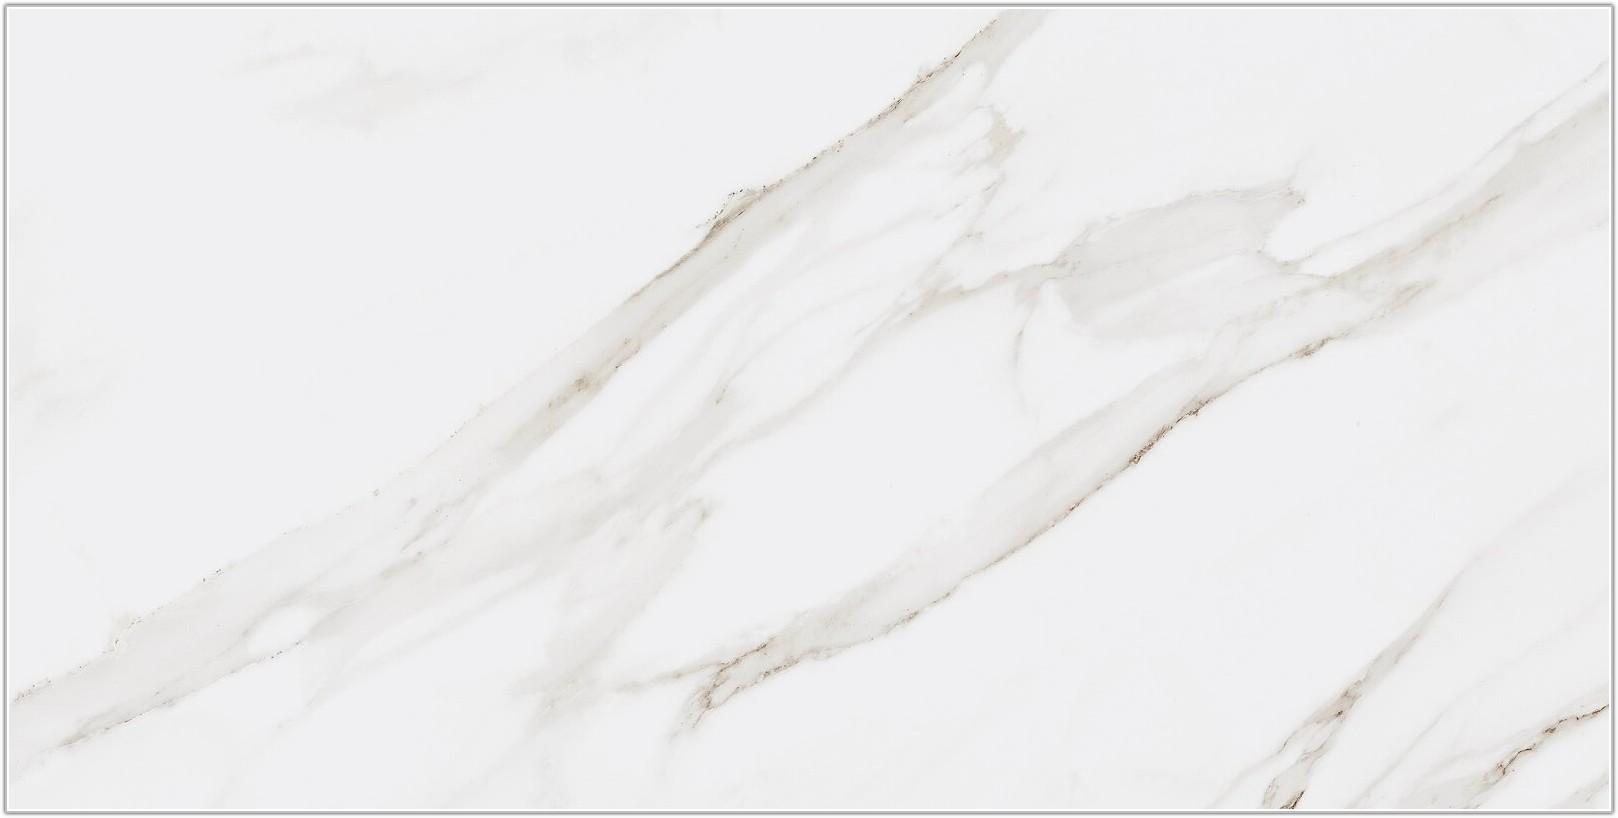 Marble Effect Tiles For Bathroom